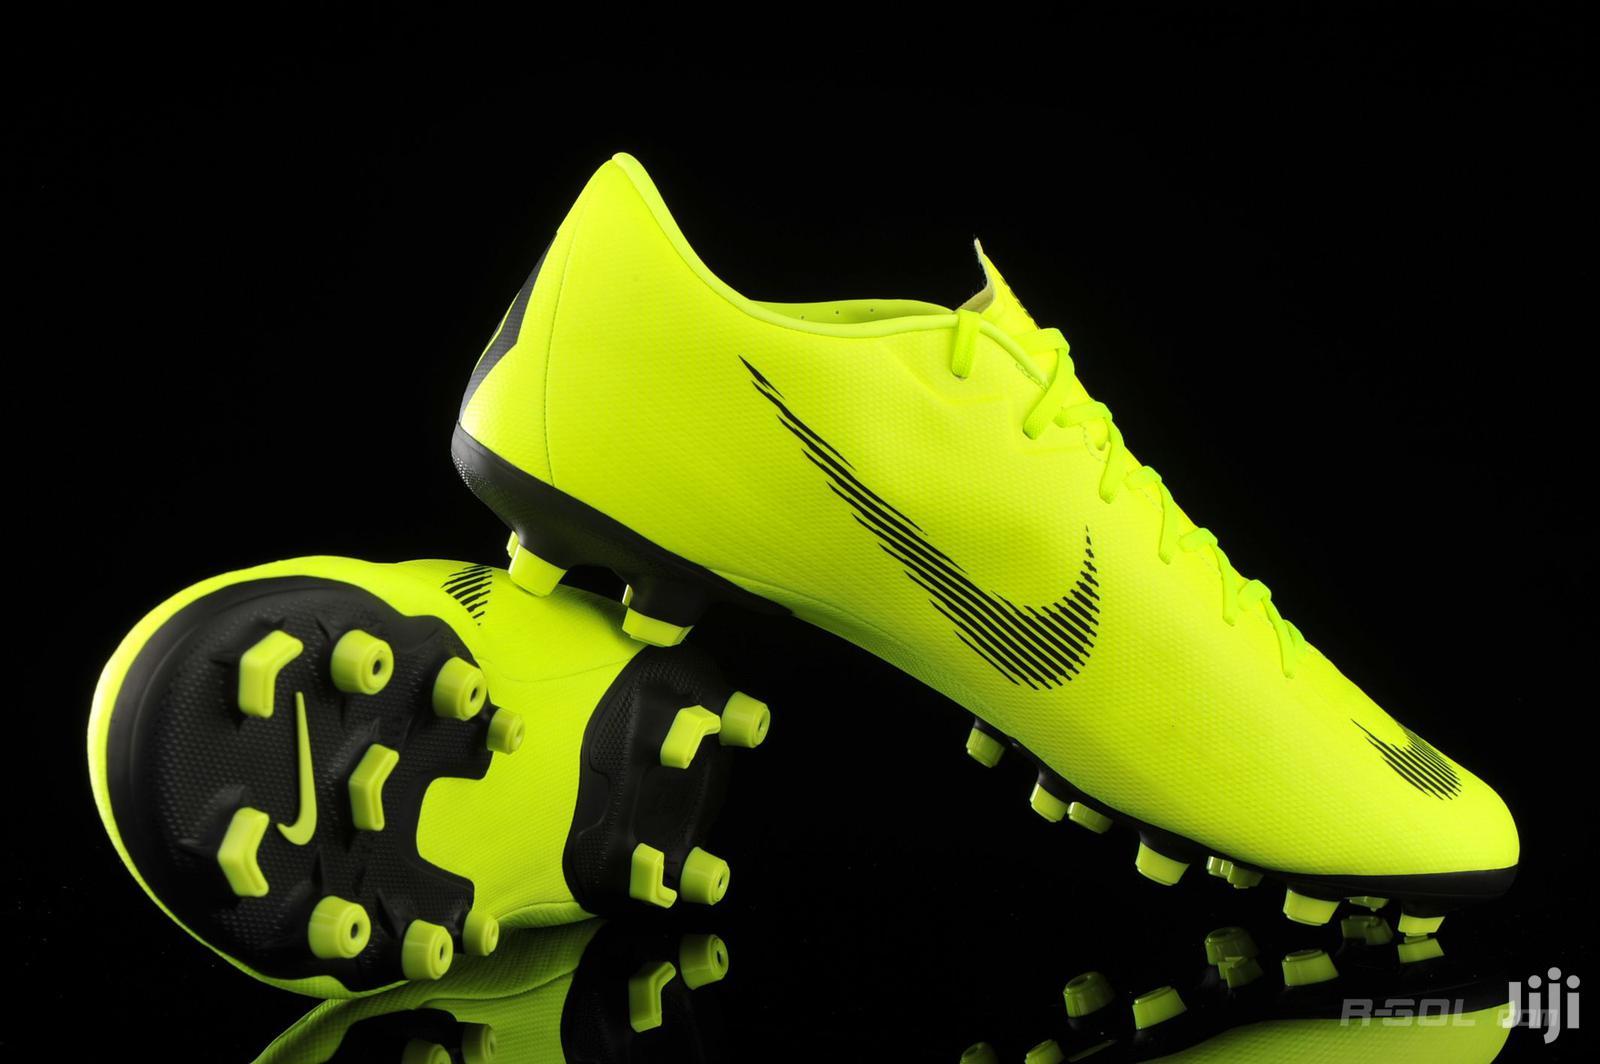 Nike Mercurial Vapor XII Soccer Boots